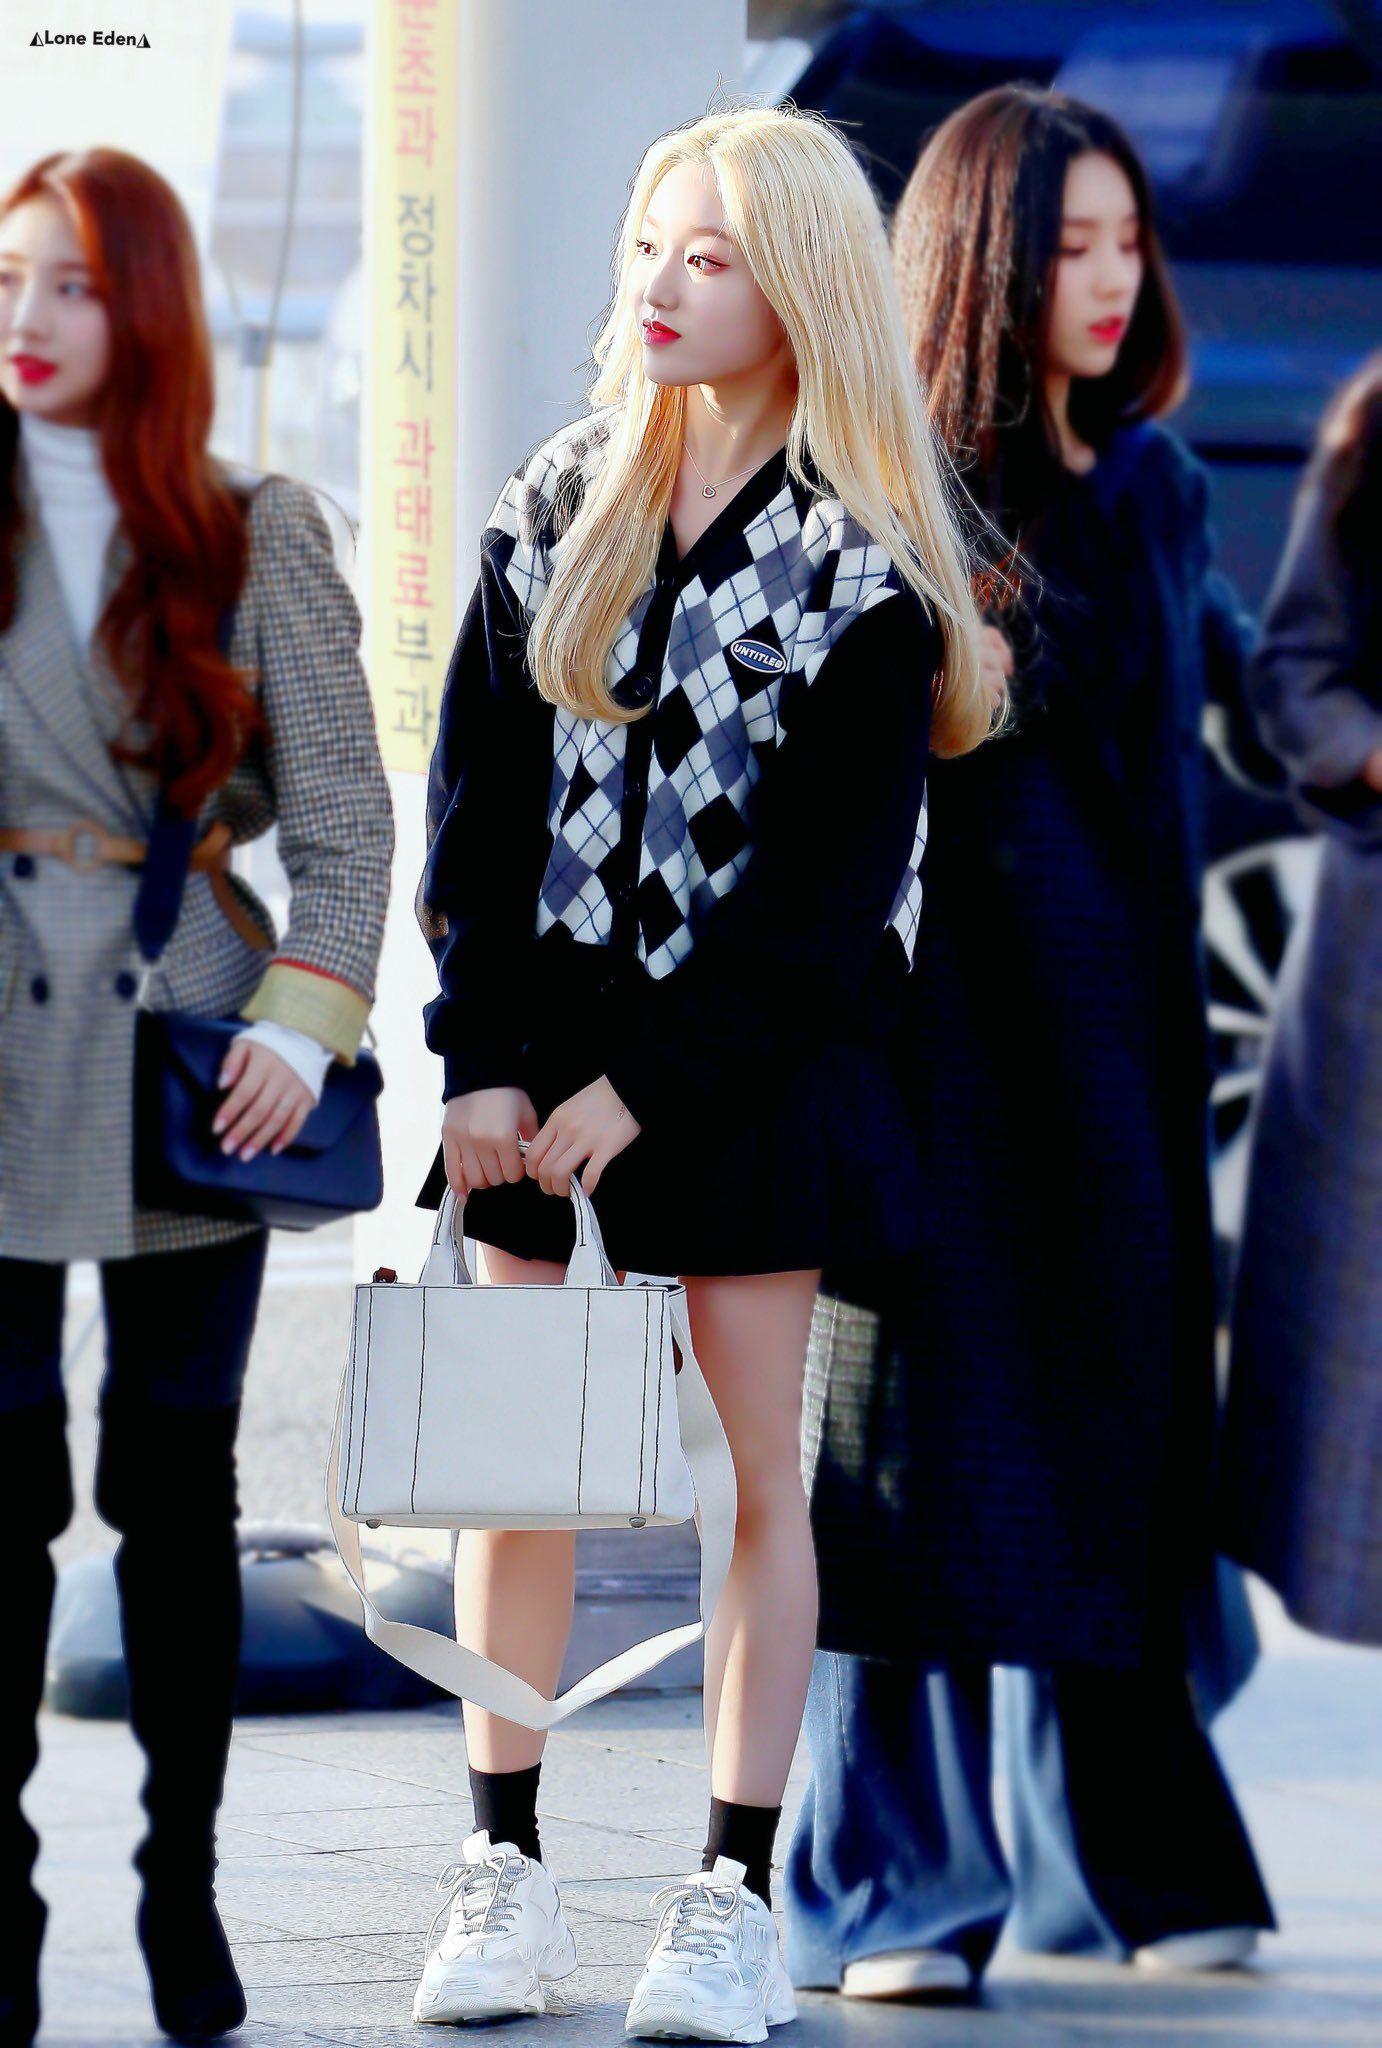 Lone Eden On Twitter Kpop Fashion Fashion Inspo Fashion